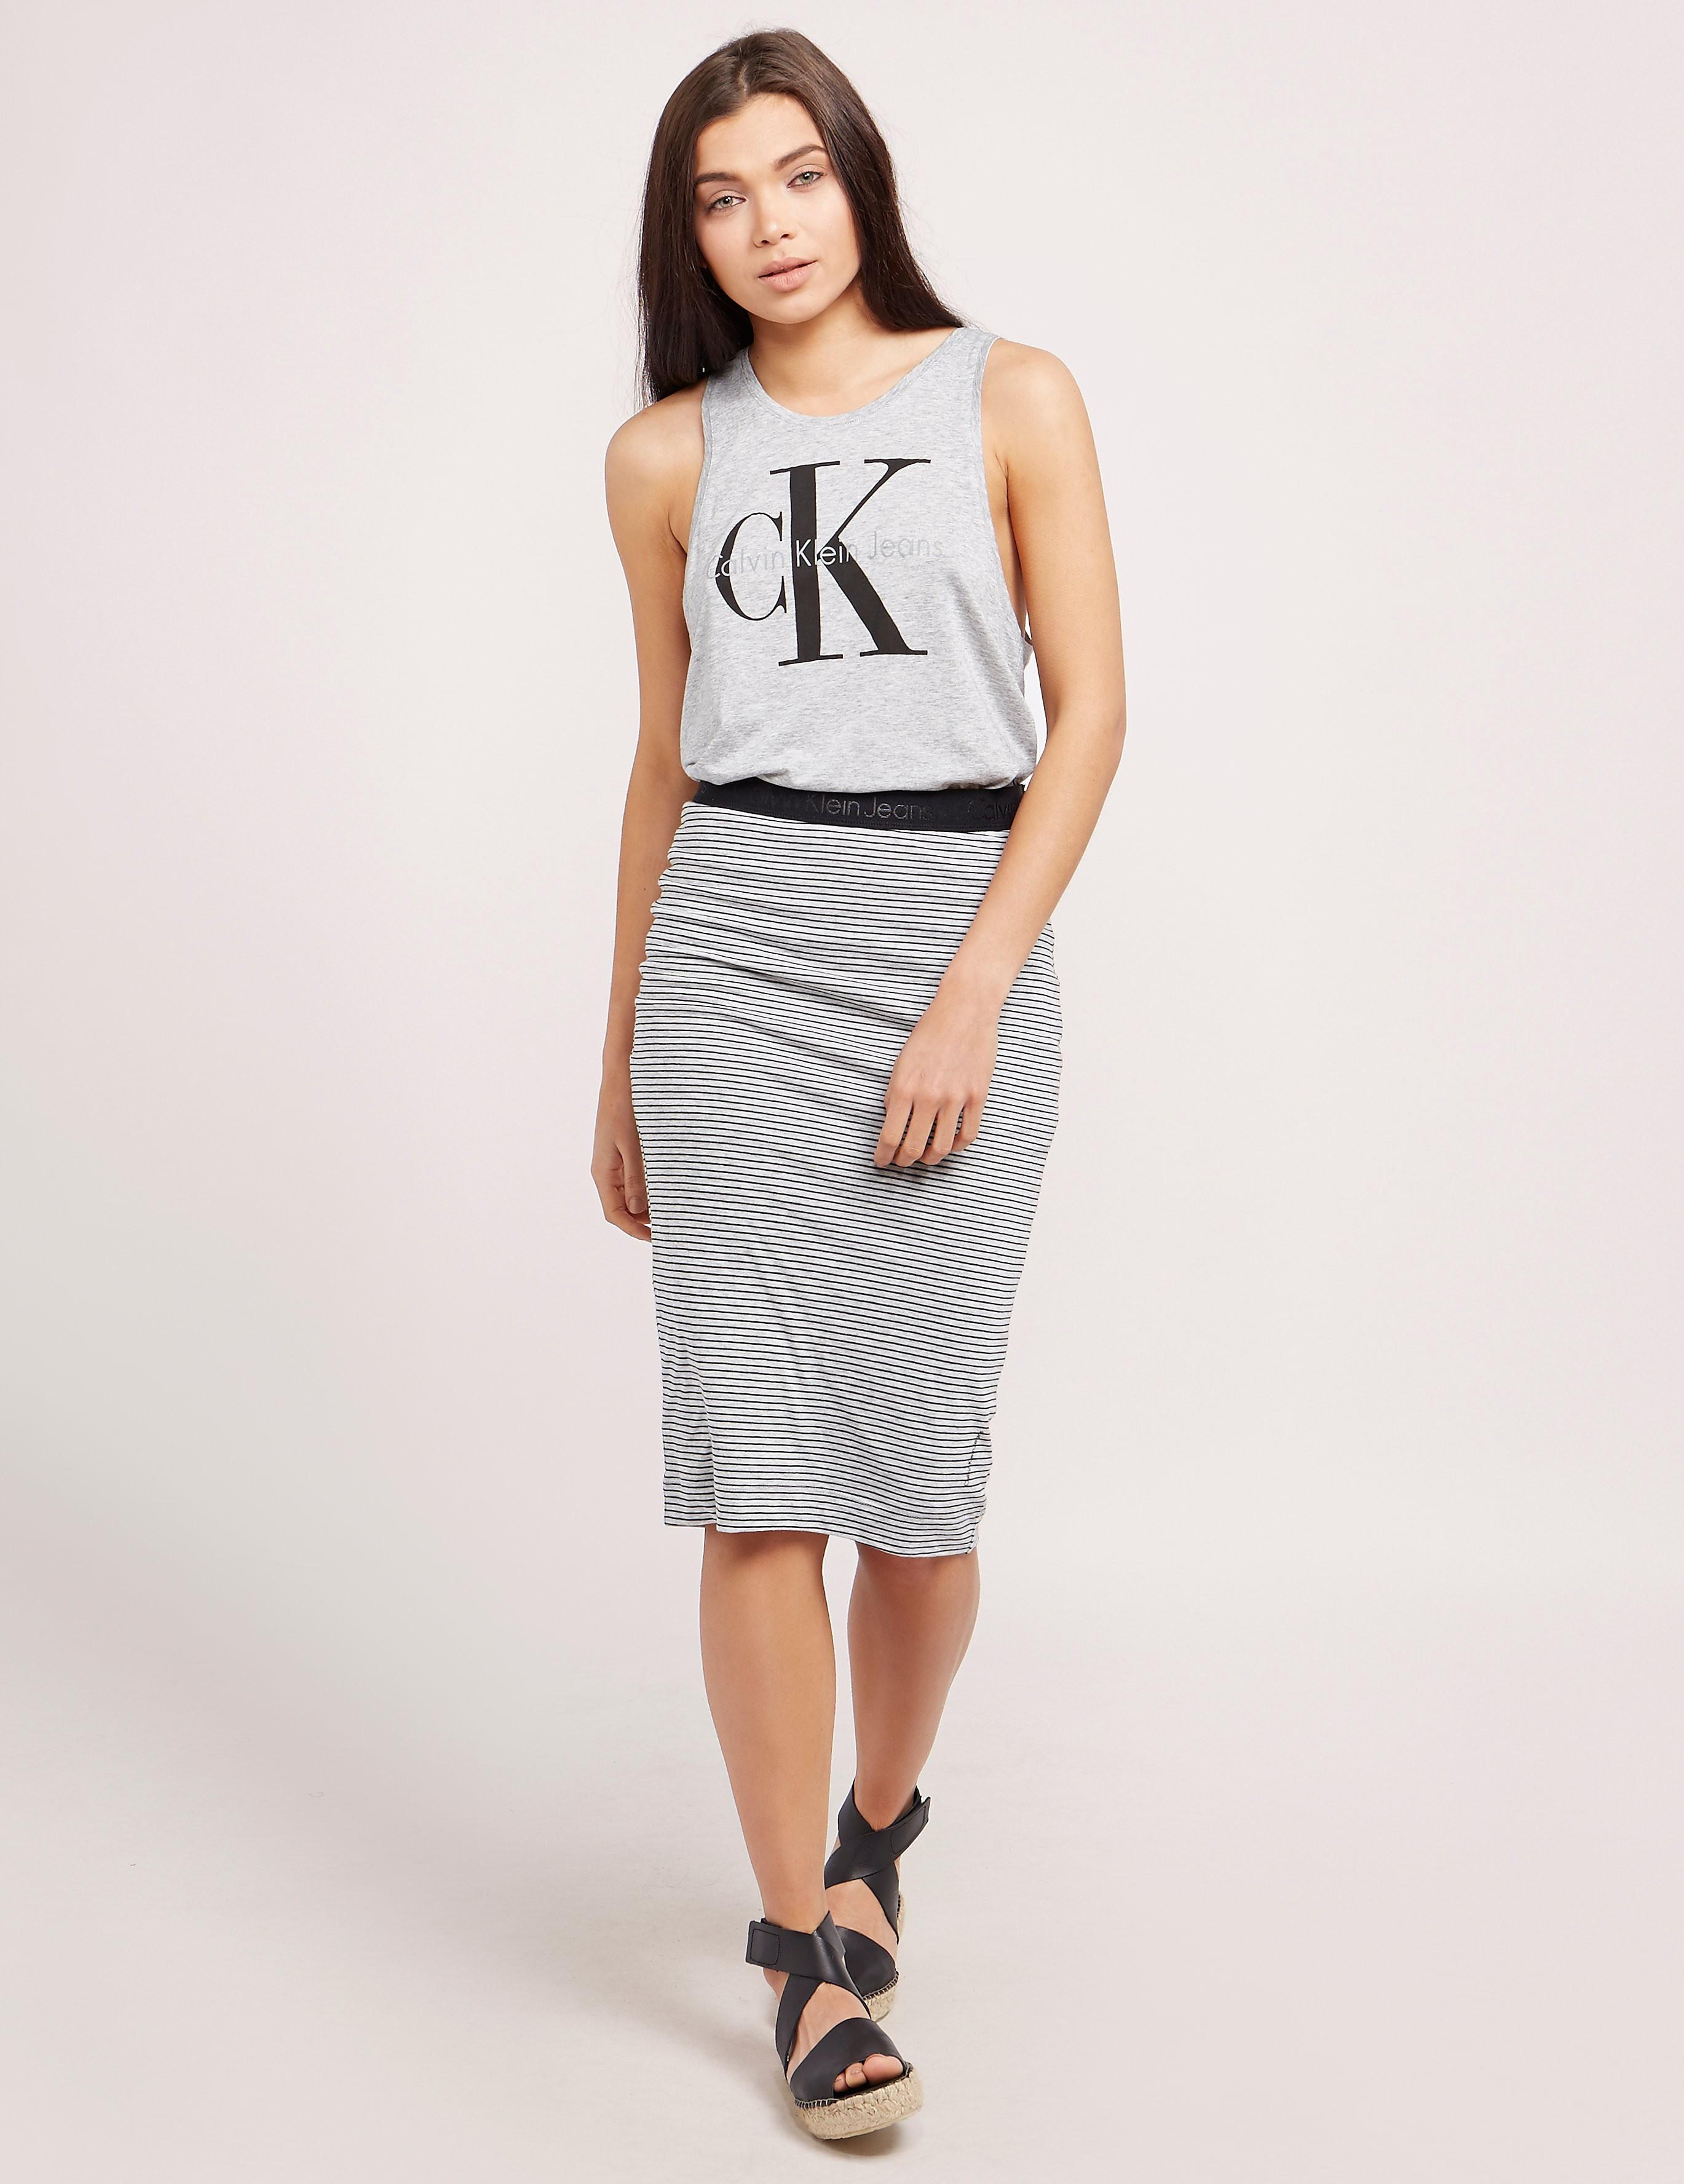 Calvin Klein Kori Skirt